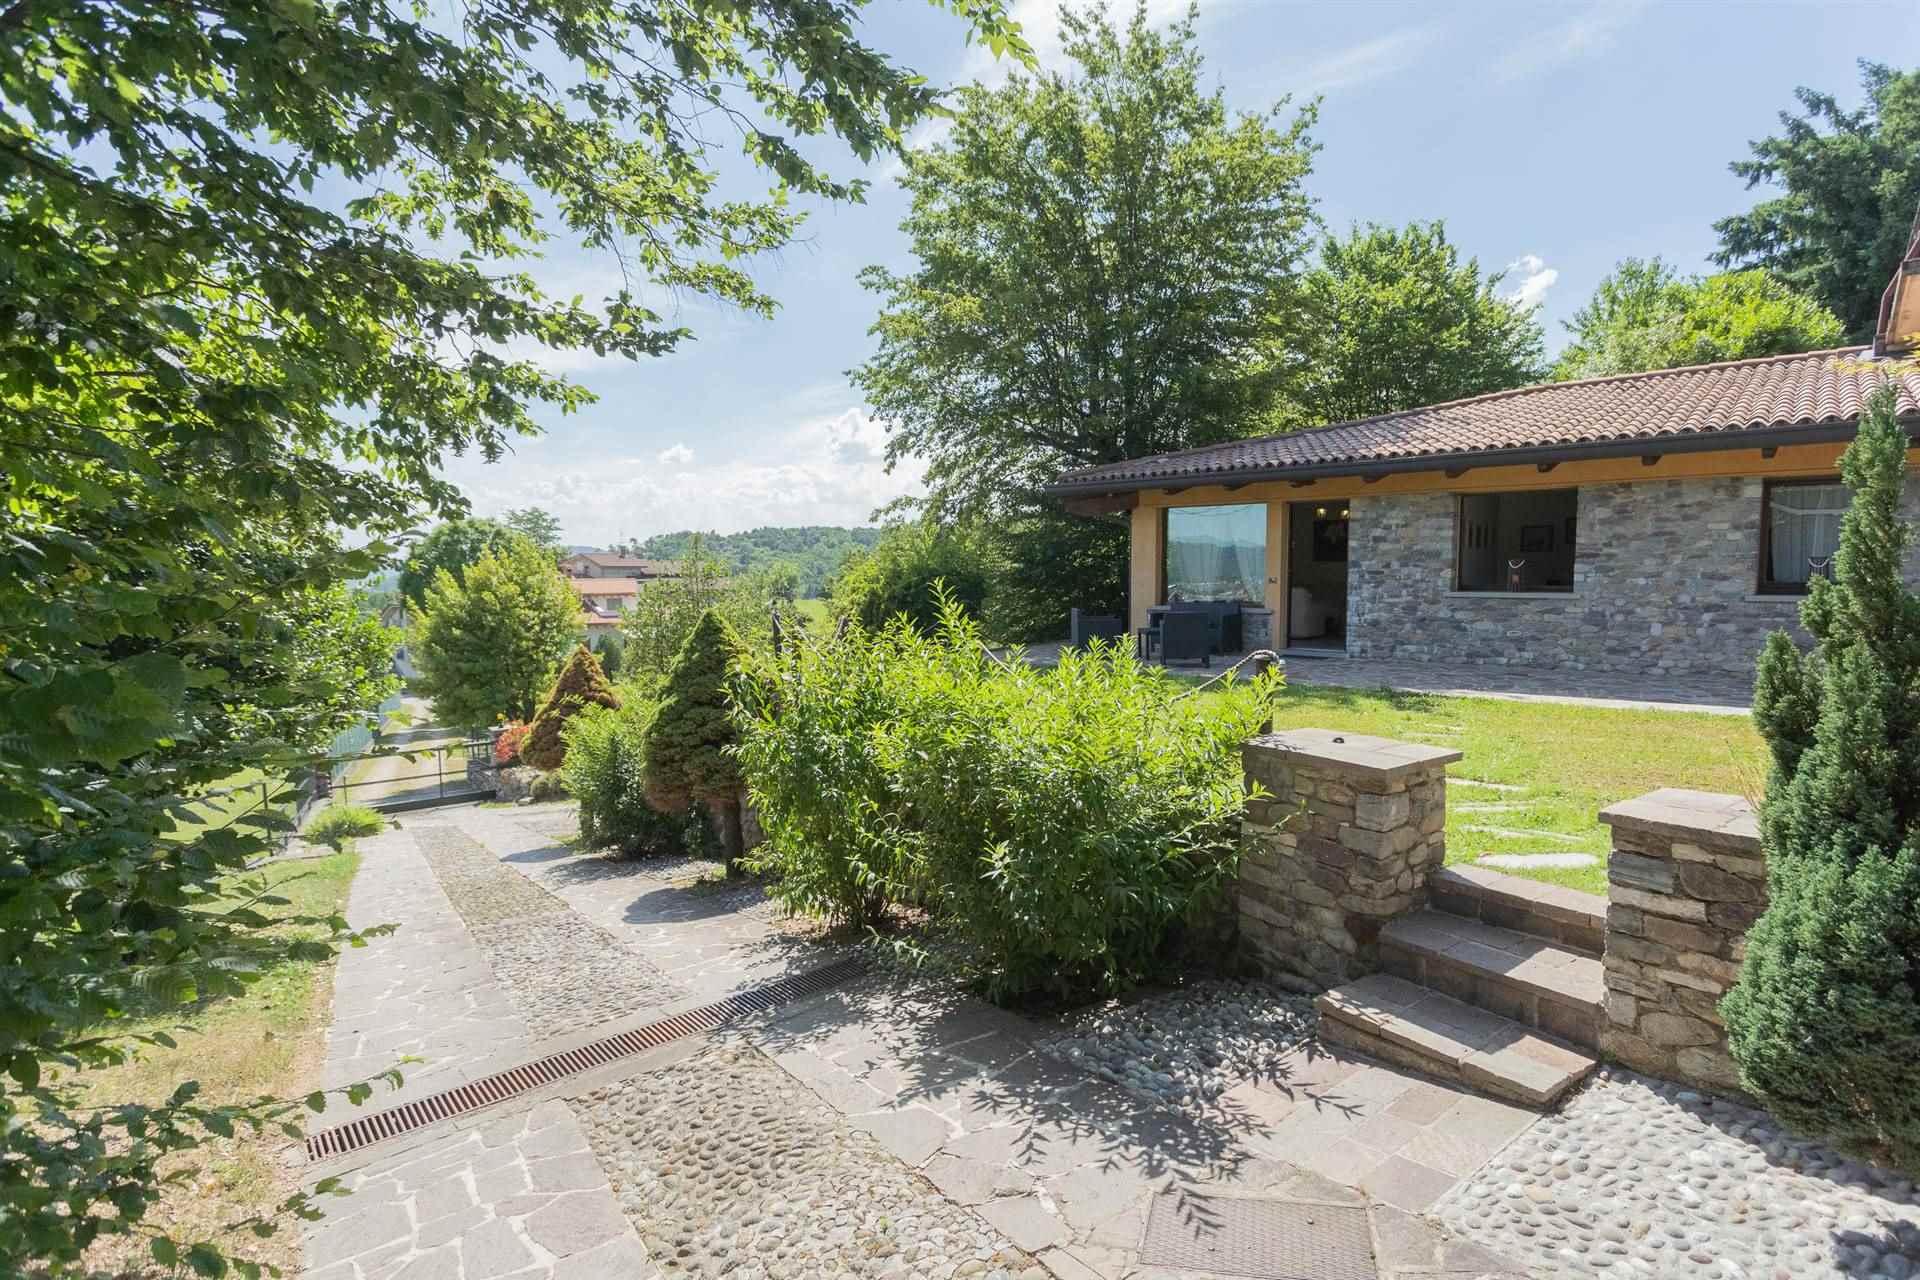 Vendita Villa unifamiliare Casa/Villa Almenno San Salvatore Via Duno  279090